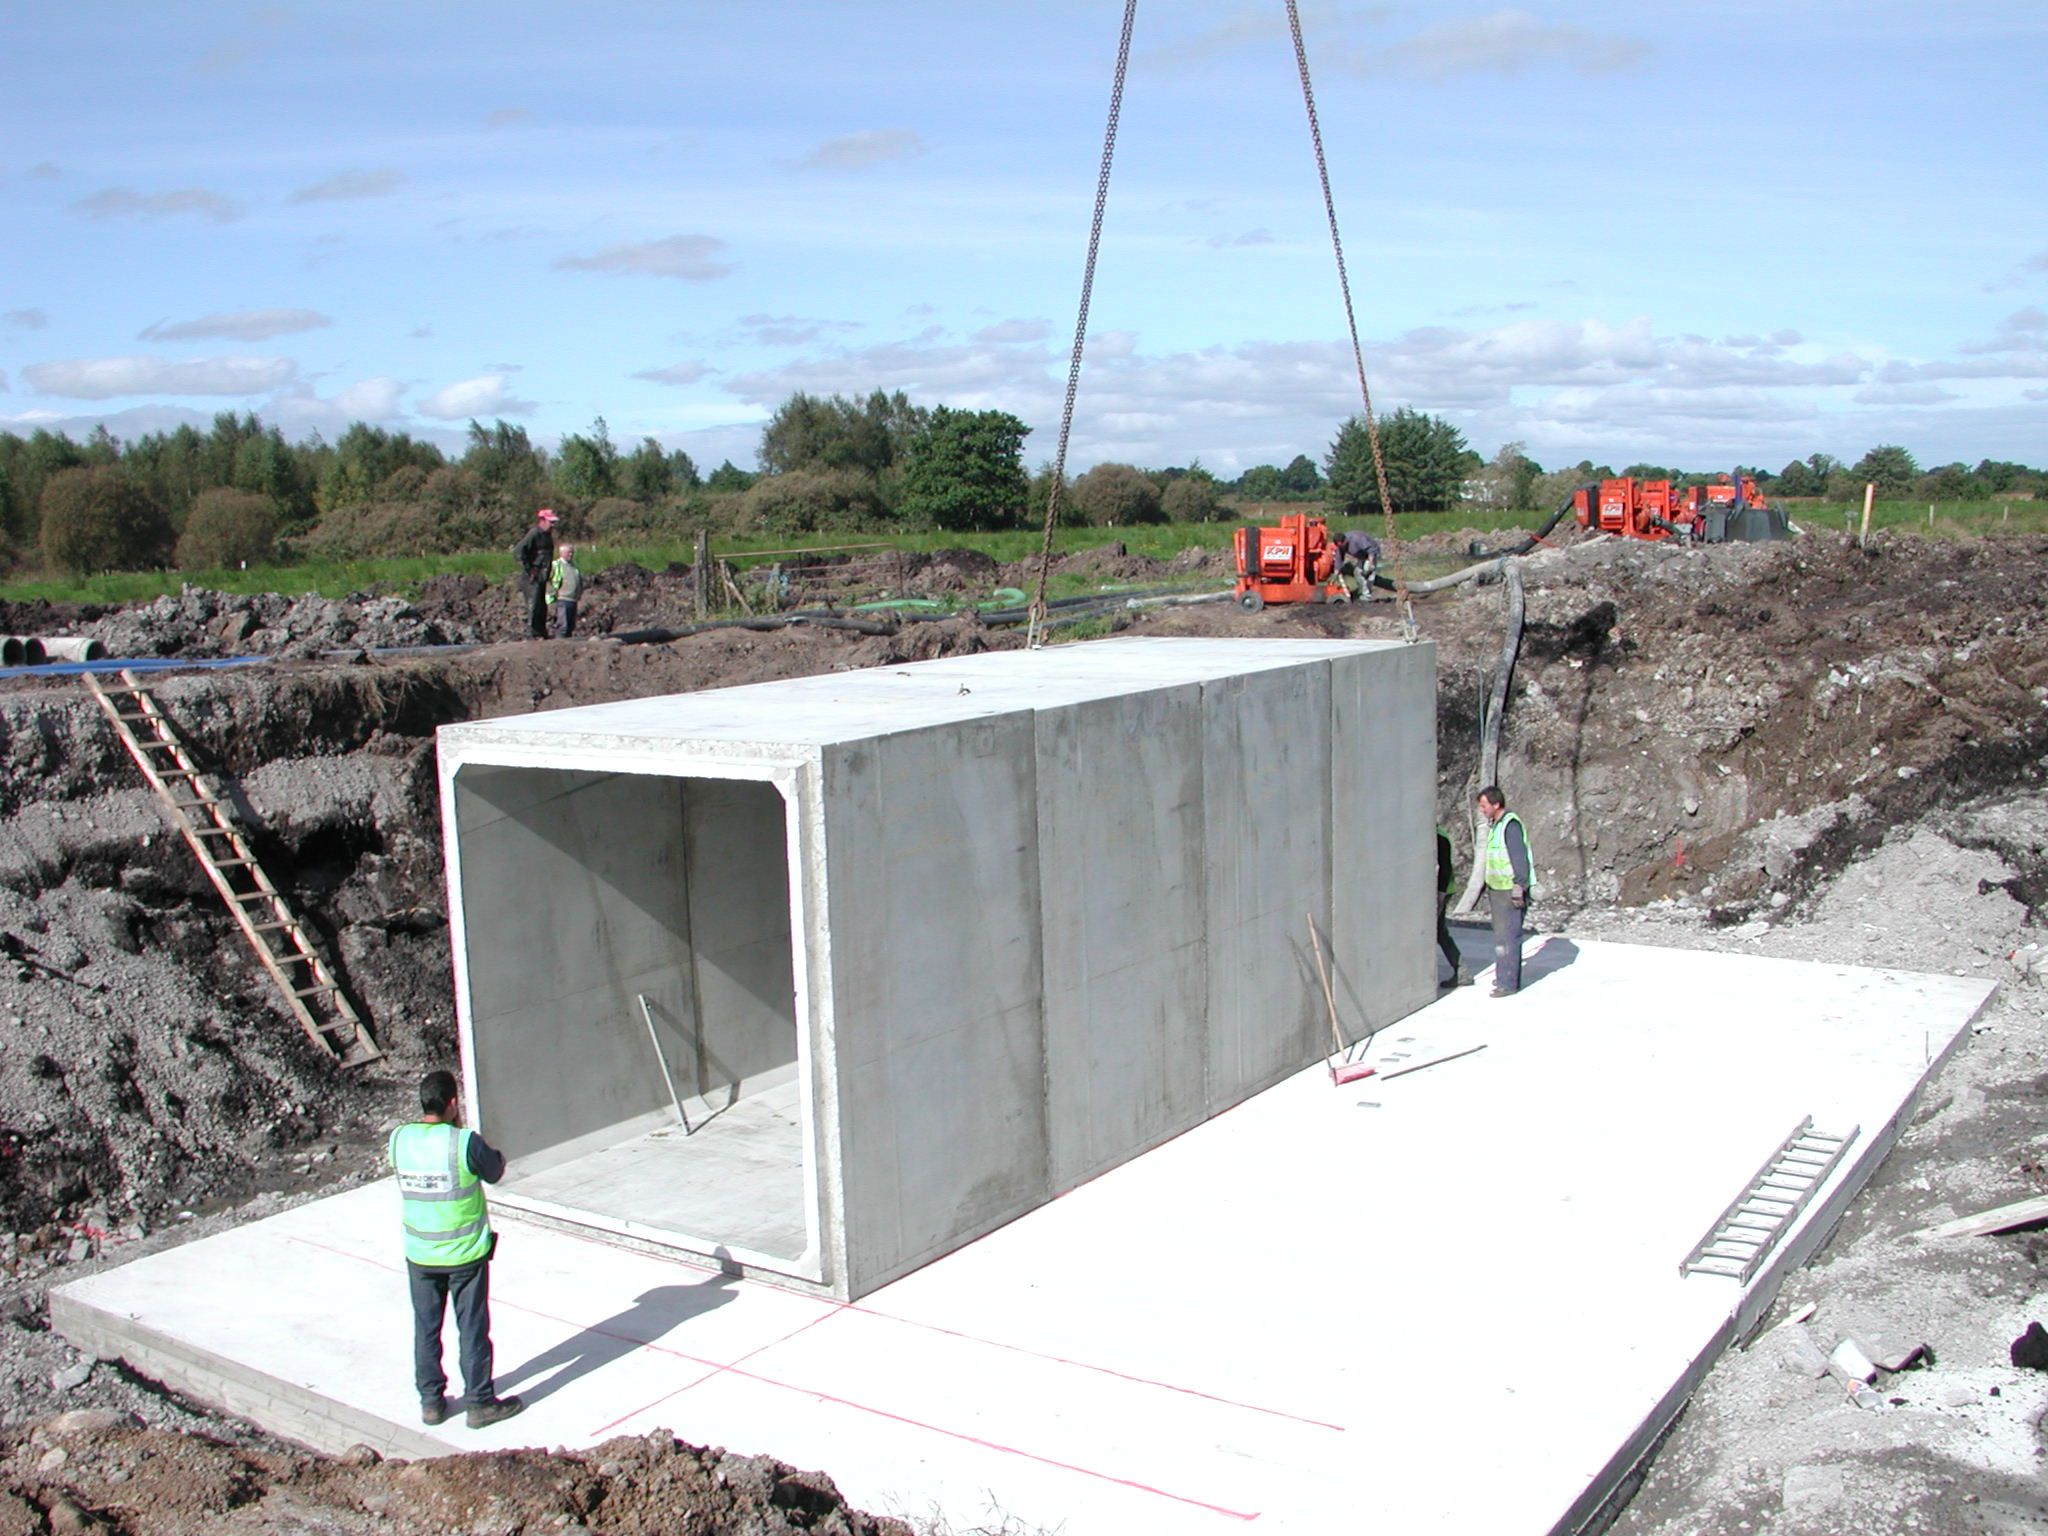 Precast Box Culverts Precast Concrete Box Culverts Bancrete UK - Prefabricated concrete homes designs